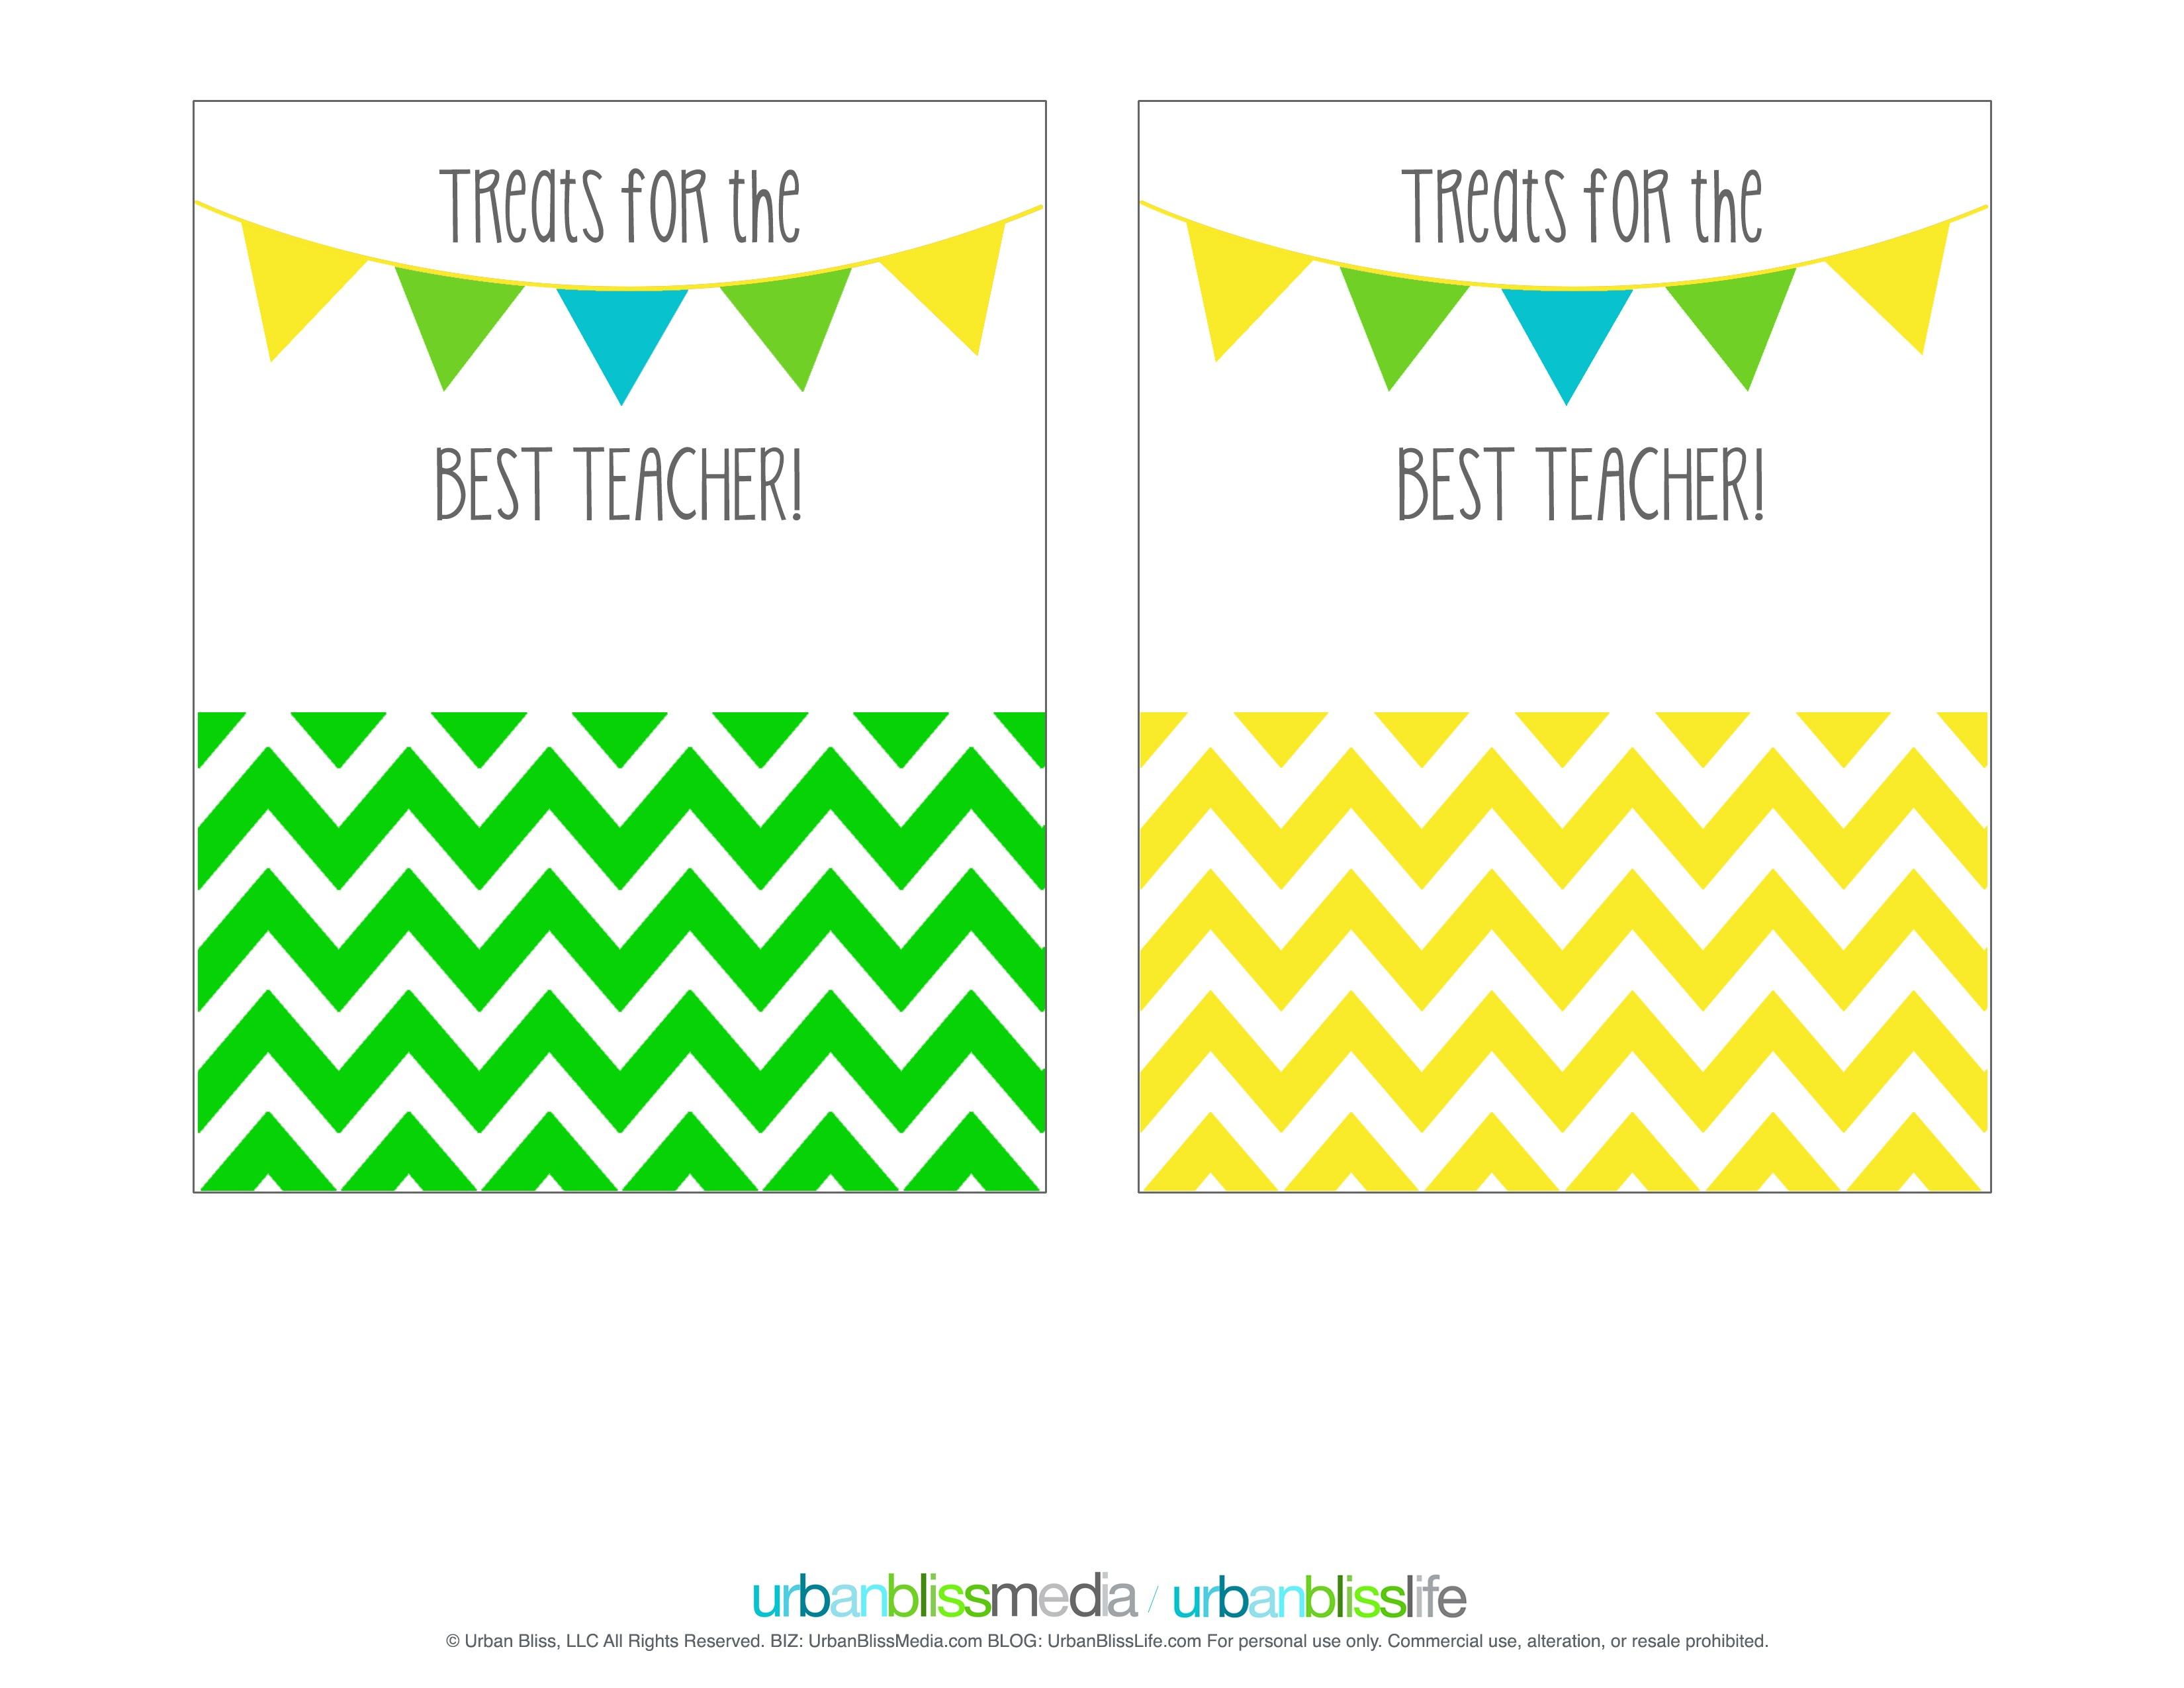 Free Printable Teacher Appreciation Cards (92+ Images In Collection - Free Printable Teacher Appreciation Cards